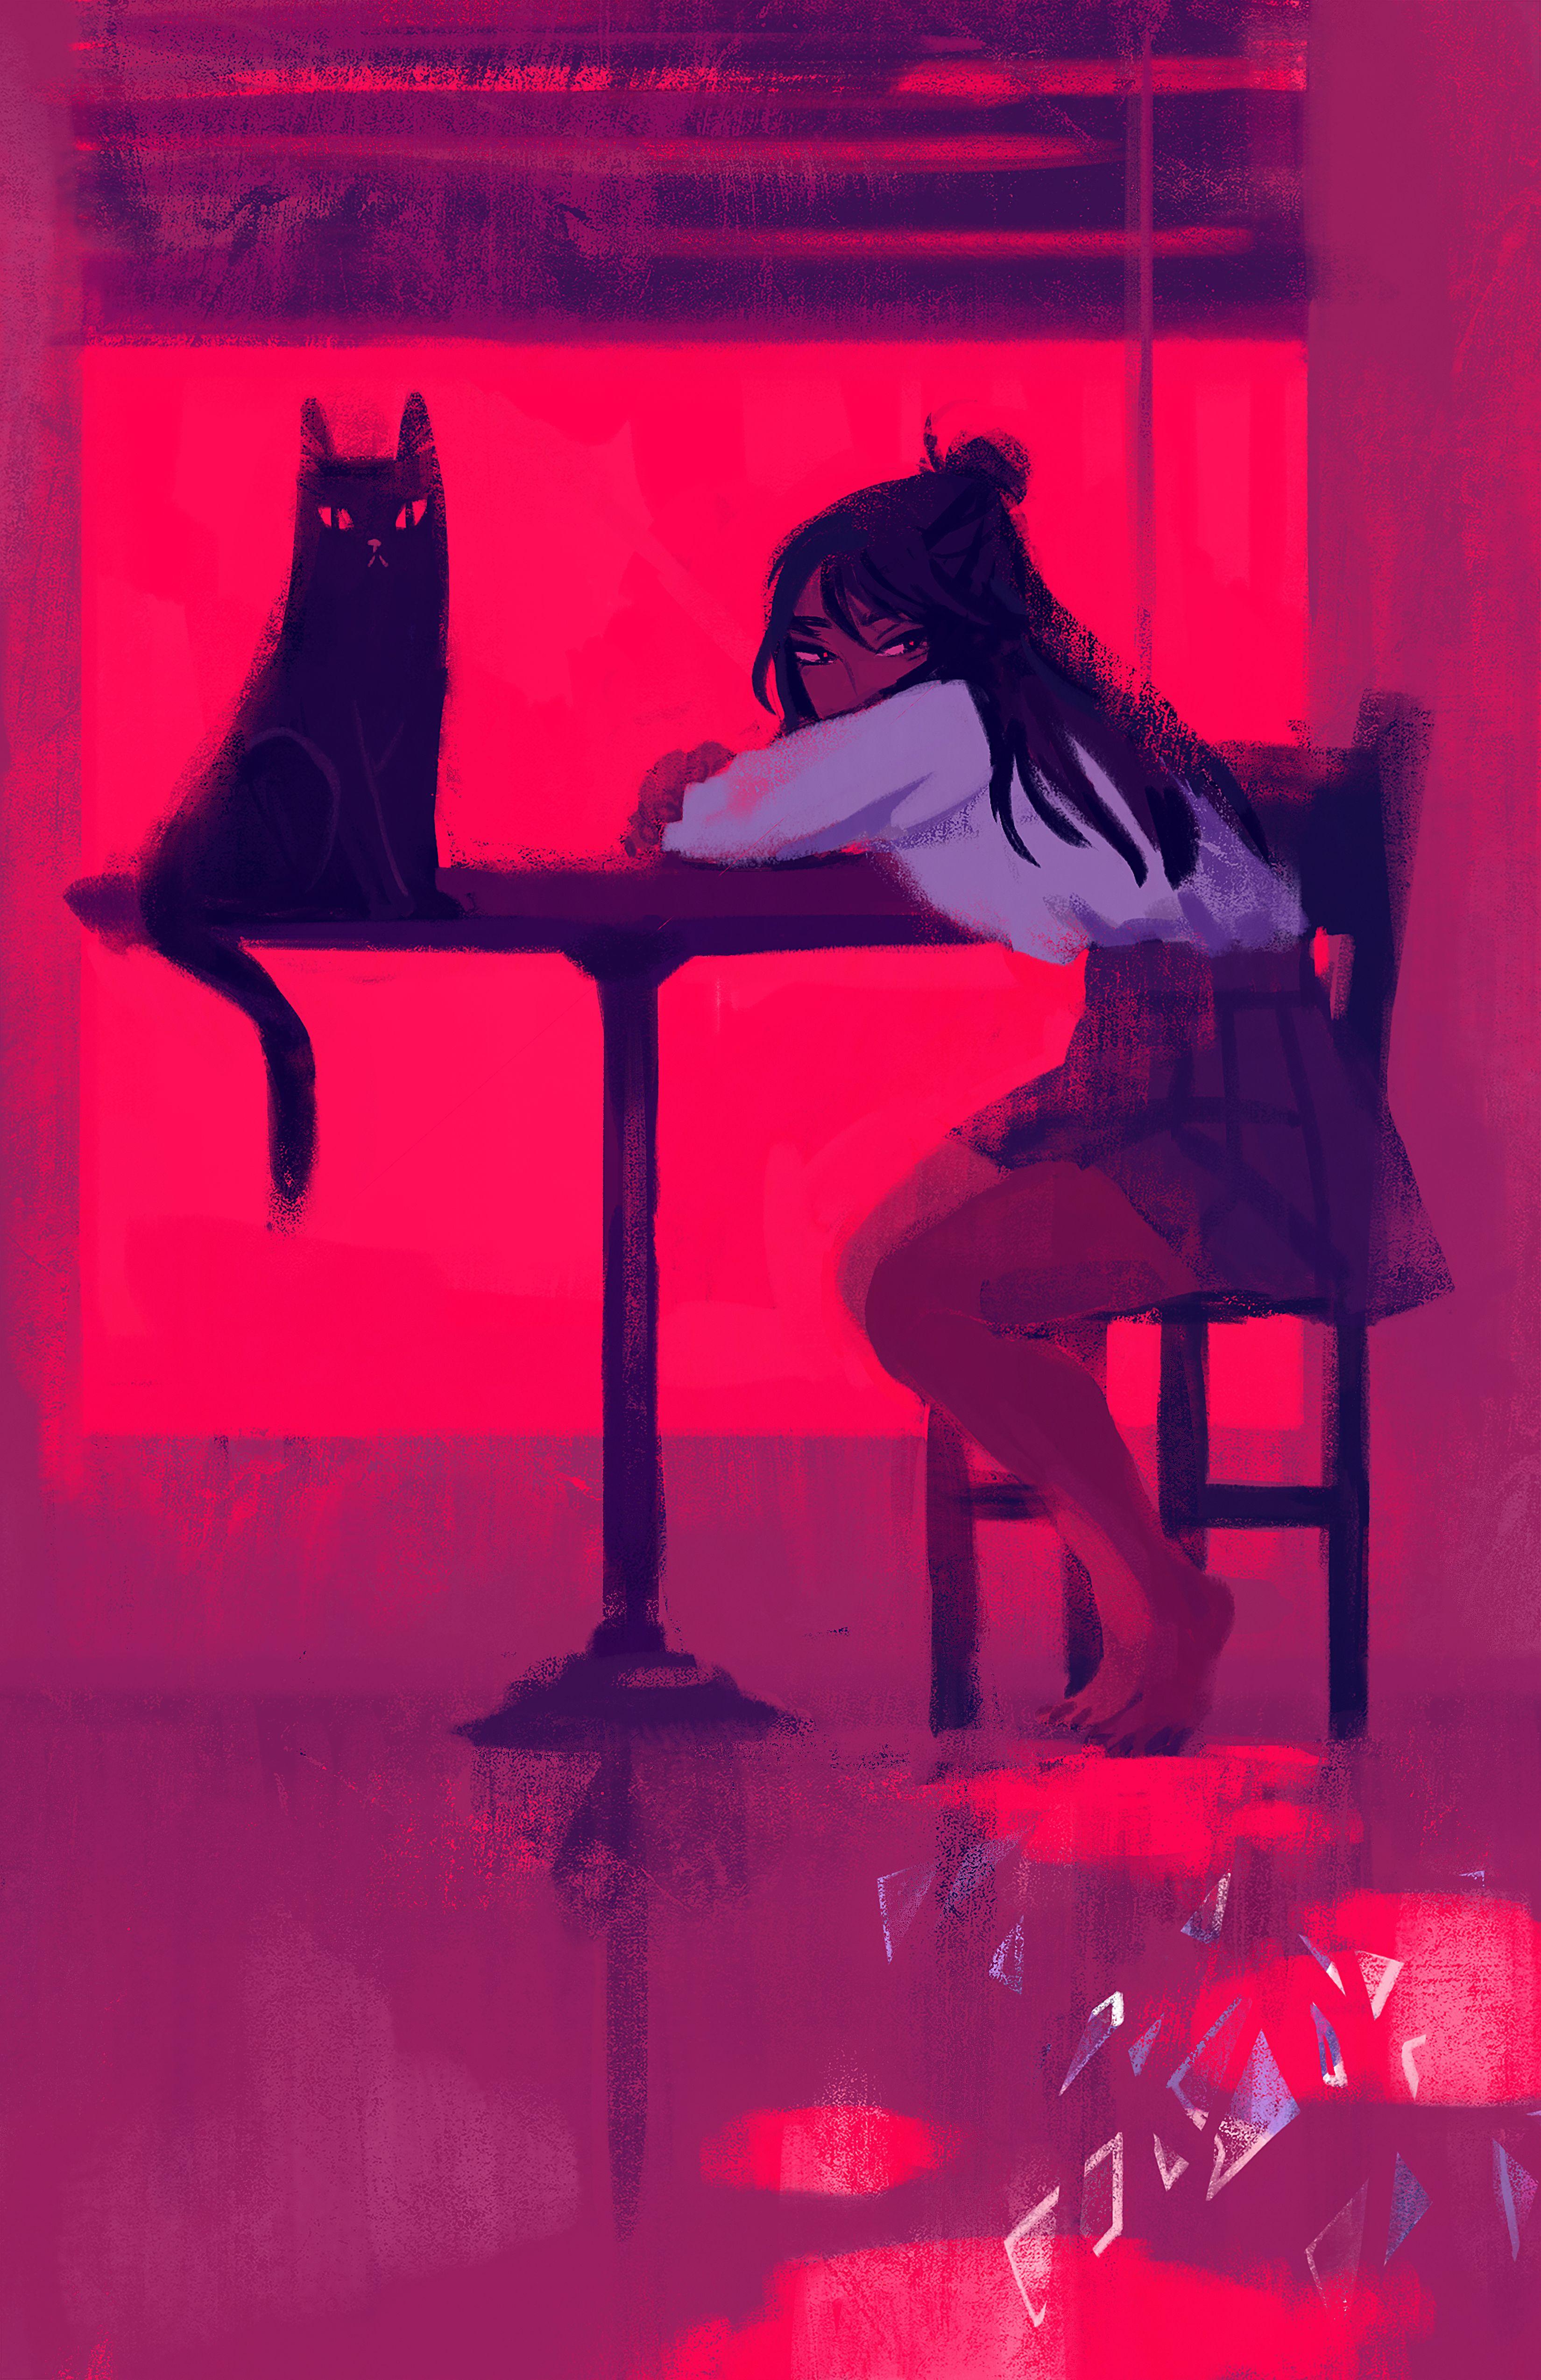 Chelsea Stingel Leave Me Alone Illustration, Anime, Art